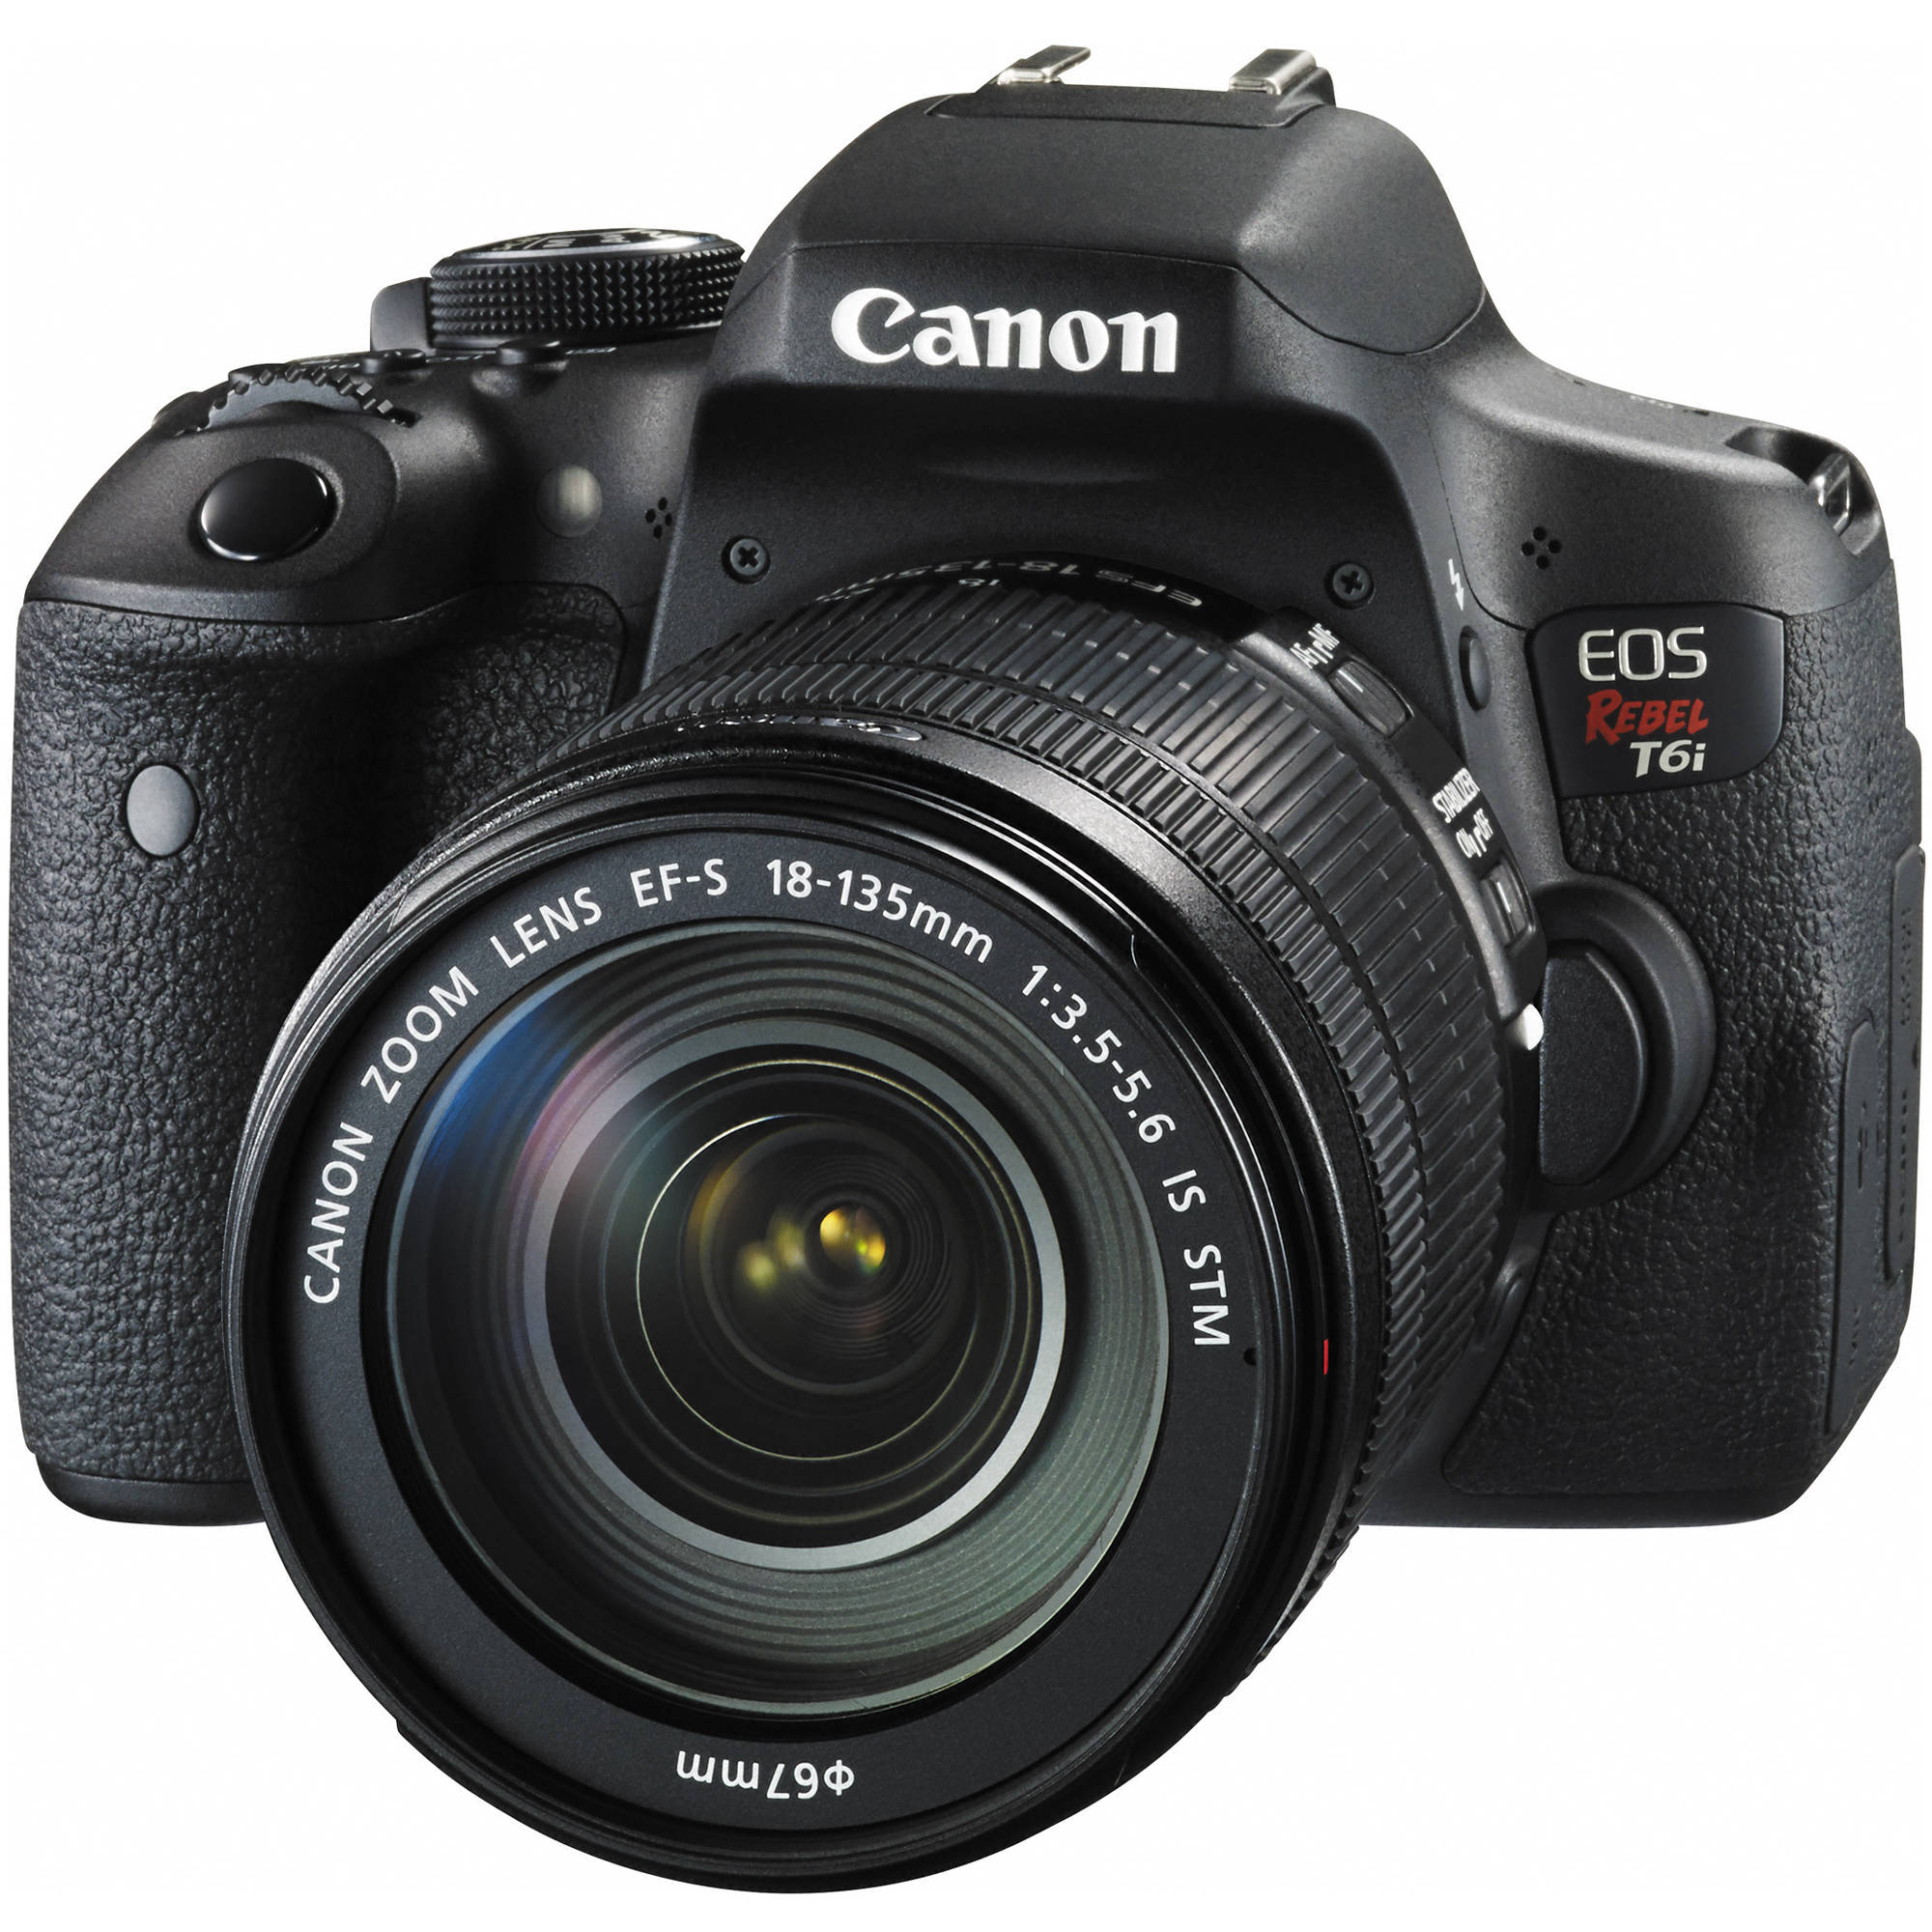 2388763c 98e3 4a47 9f0f 0c0b4b4a4f7e 1.bae805256e727b544beb9314f529540f - Canon EOS Rebel T6/EOS 1300D review